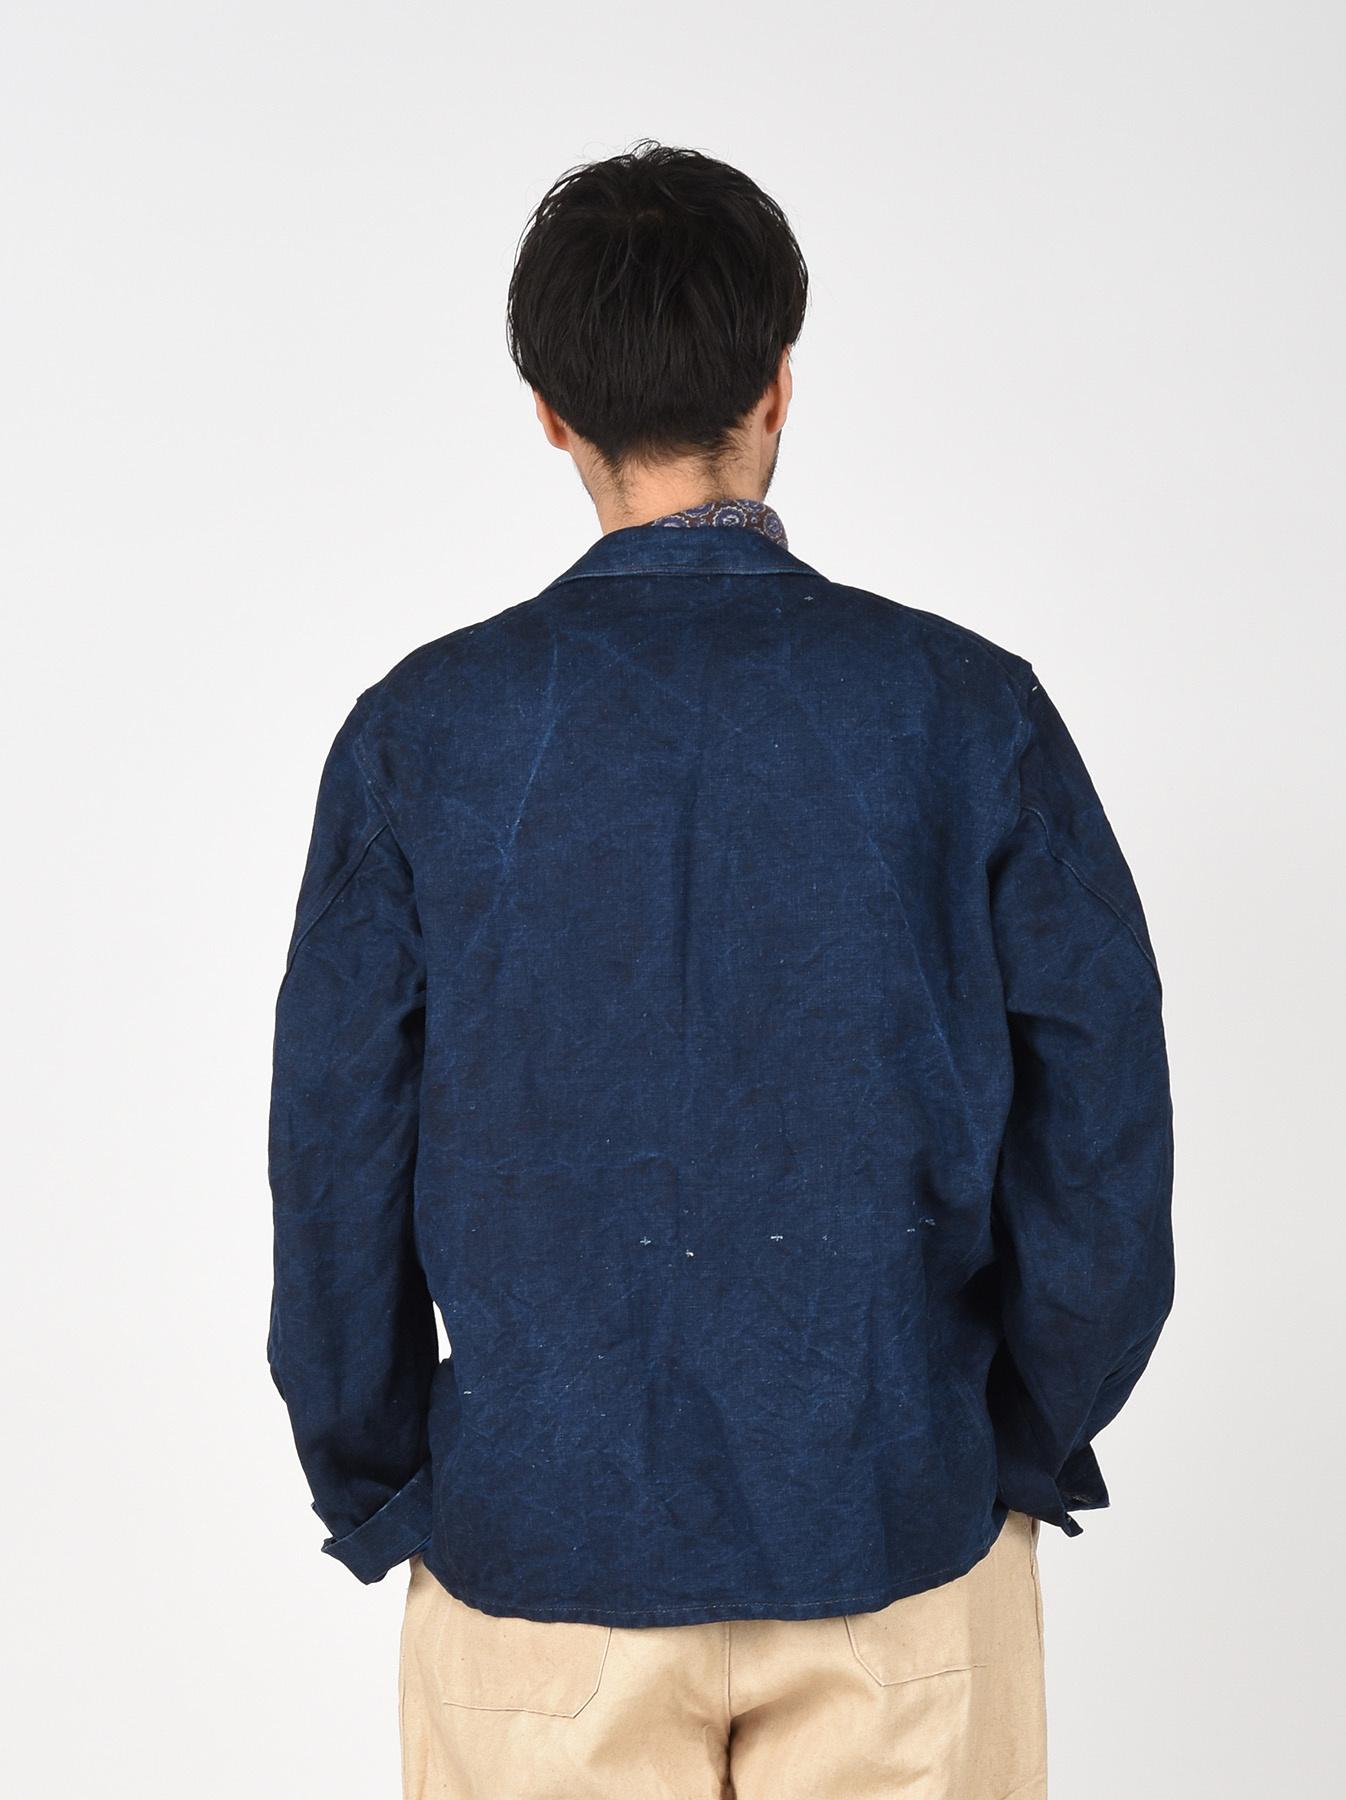 Indigo Linen Duck Asama Jacket-5